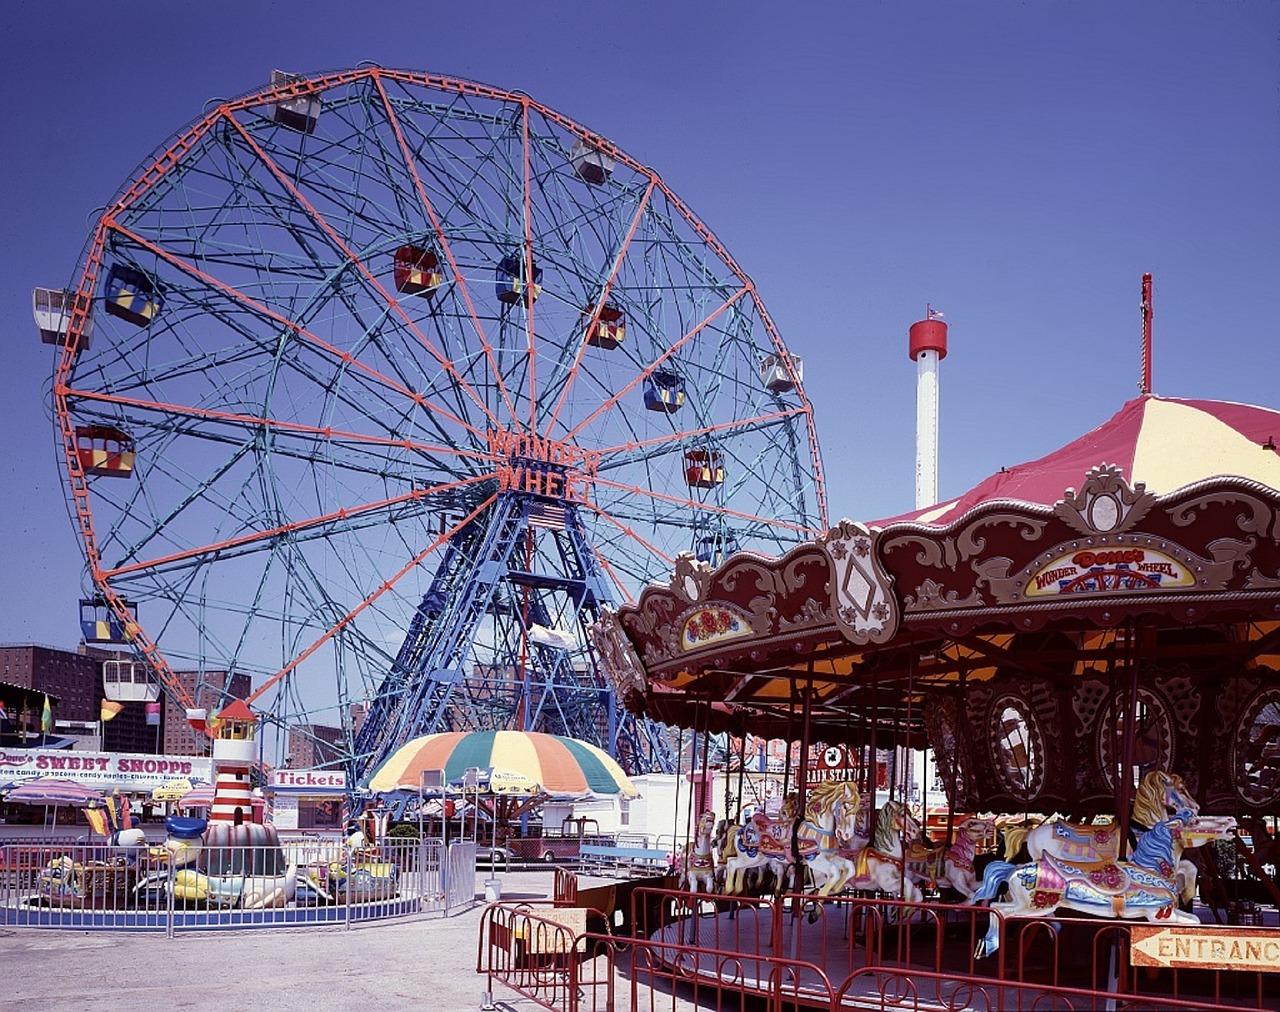 Ferris wheel at Coney Island, New York City